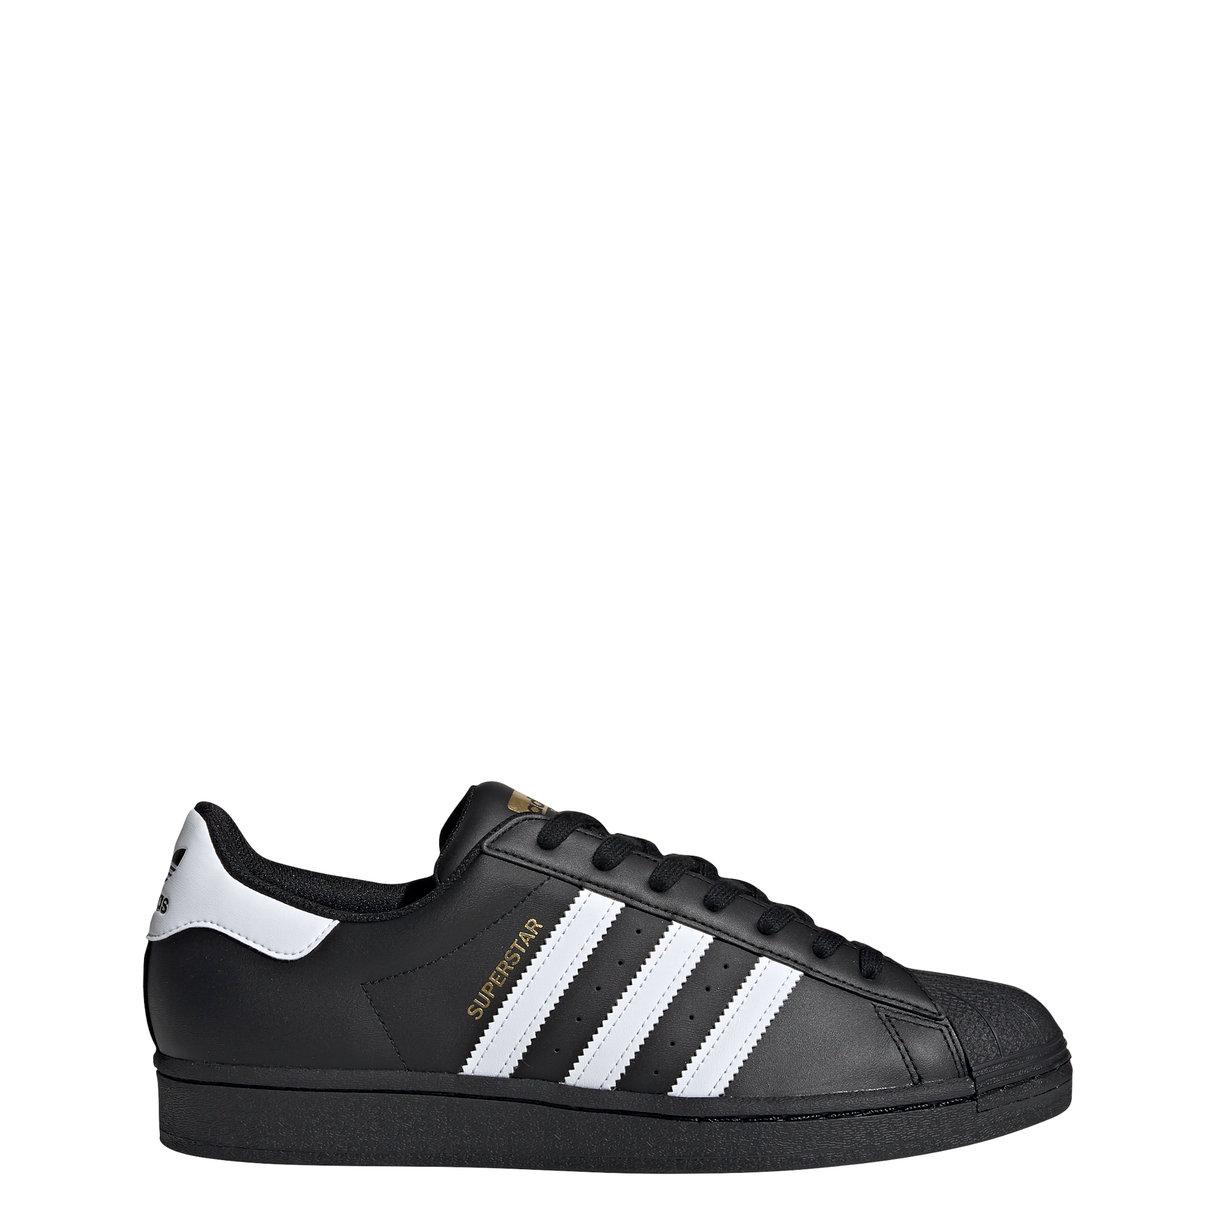 adidas nuovi arrivi scarpe